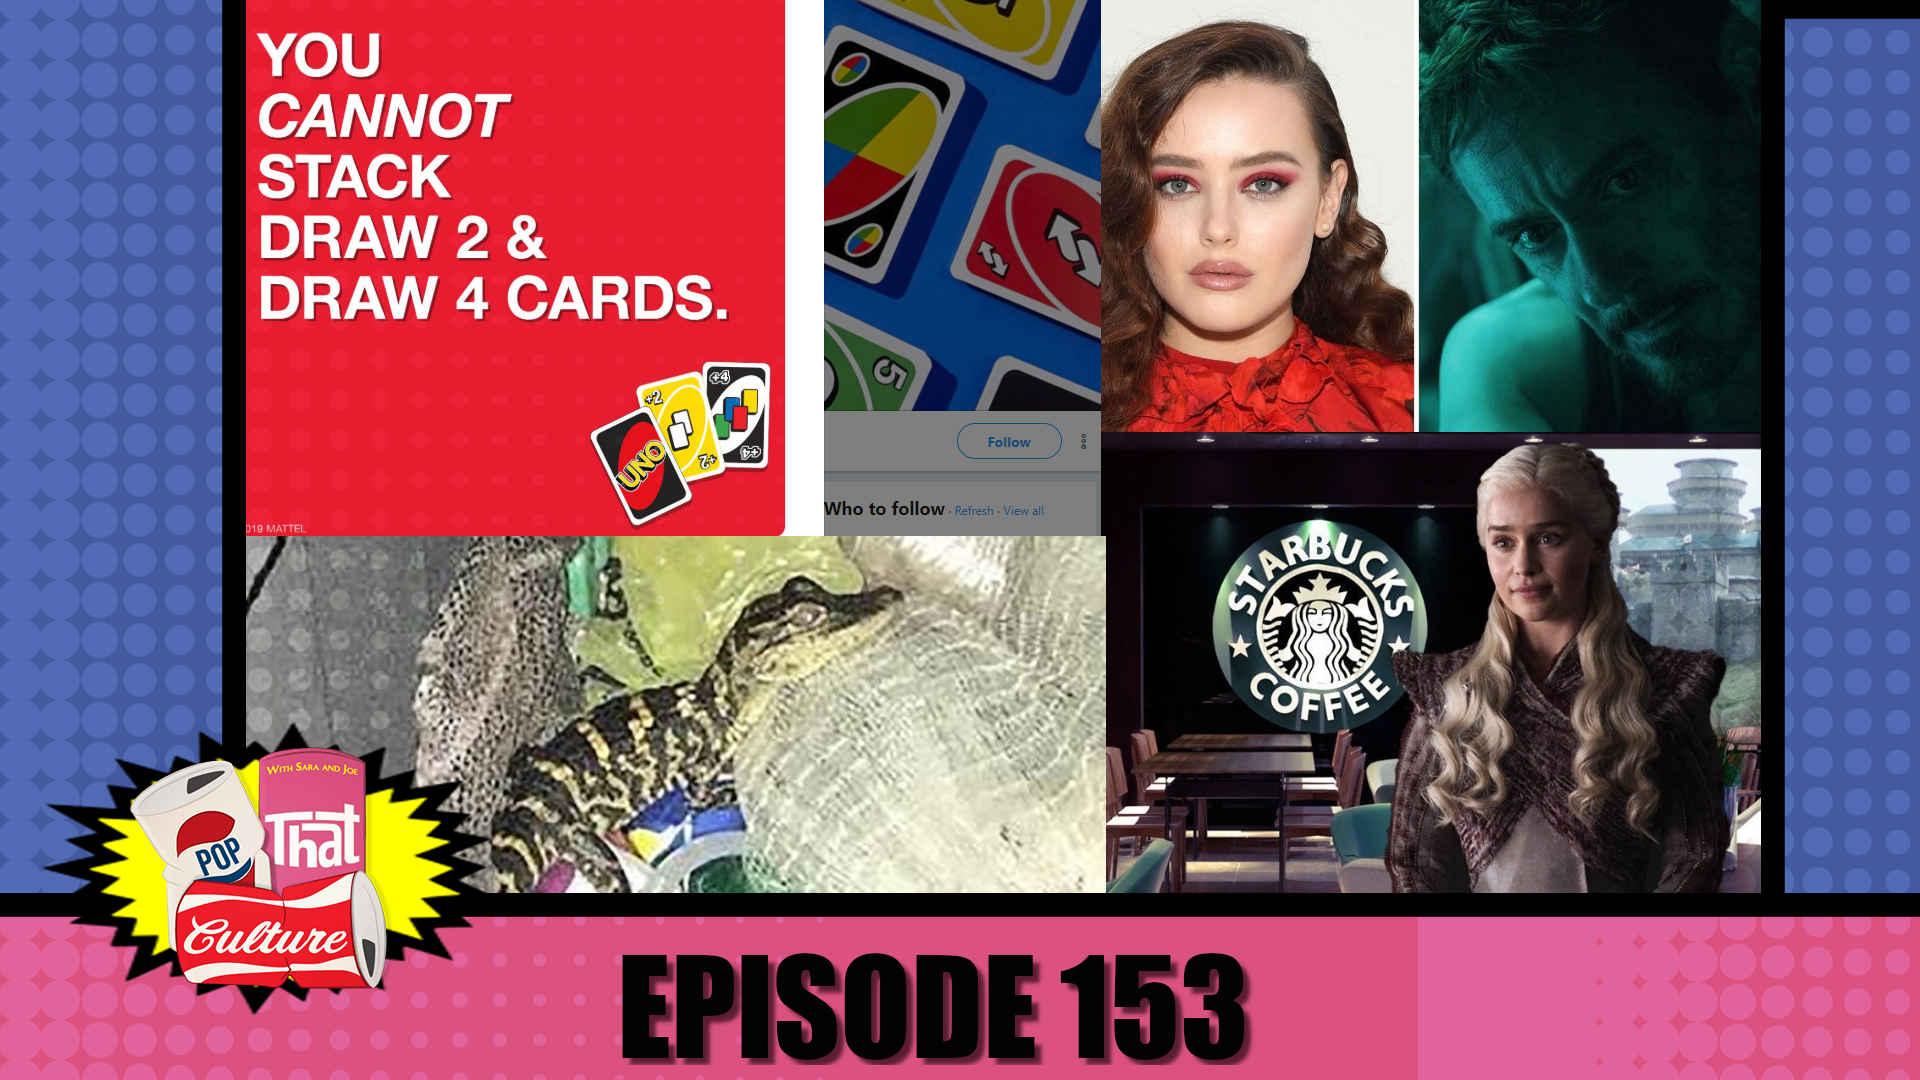 Pop That Culture - Episode 153